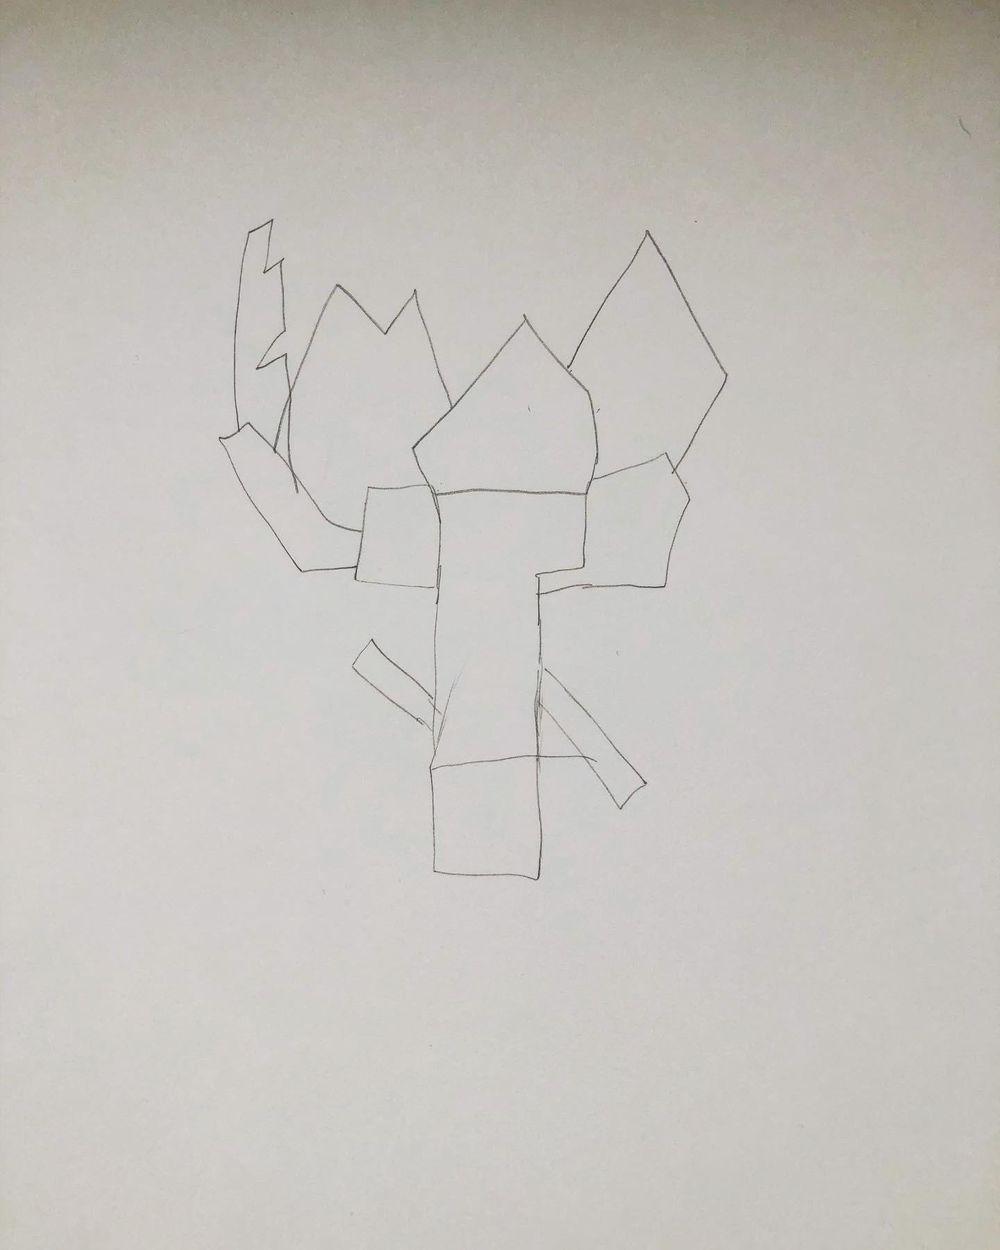 Exploration - artichoke drawings - image 7 - student project